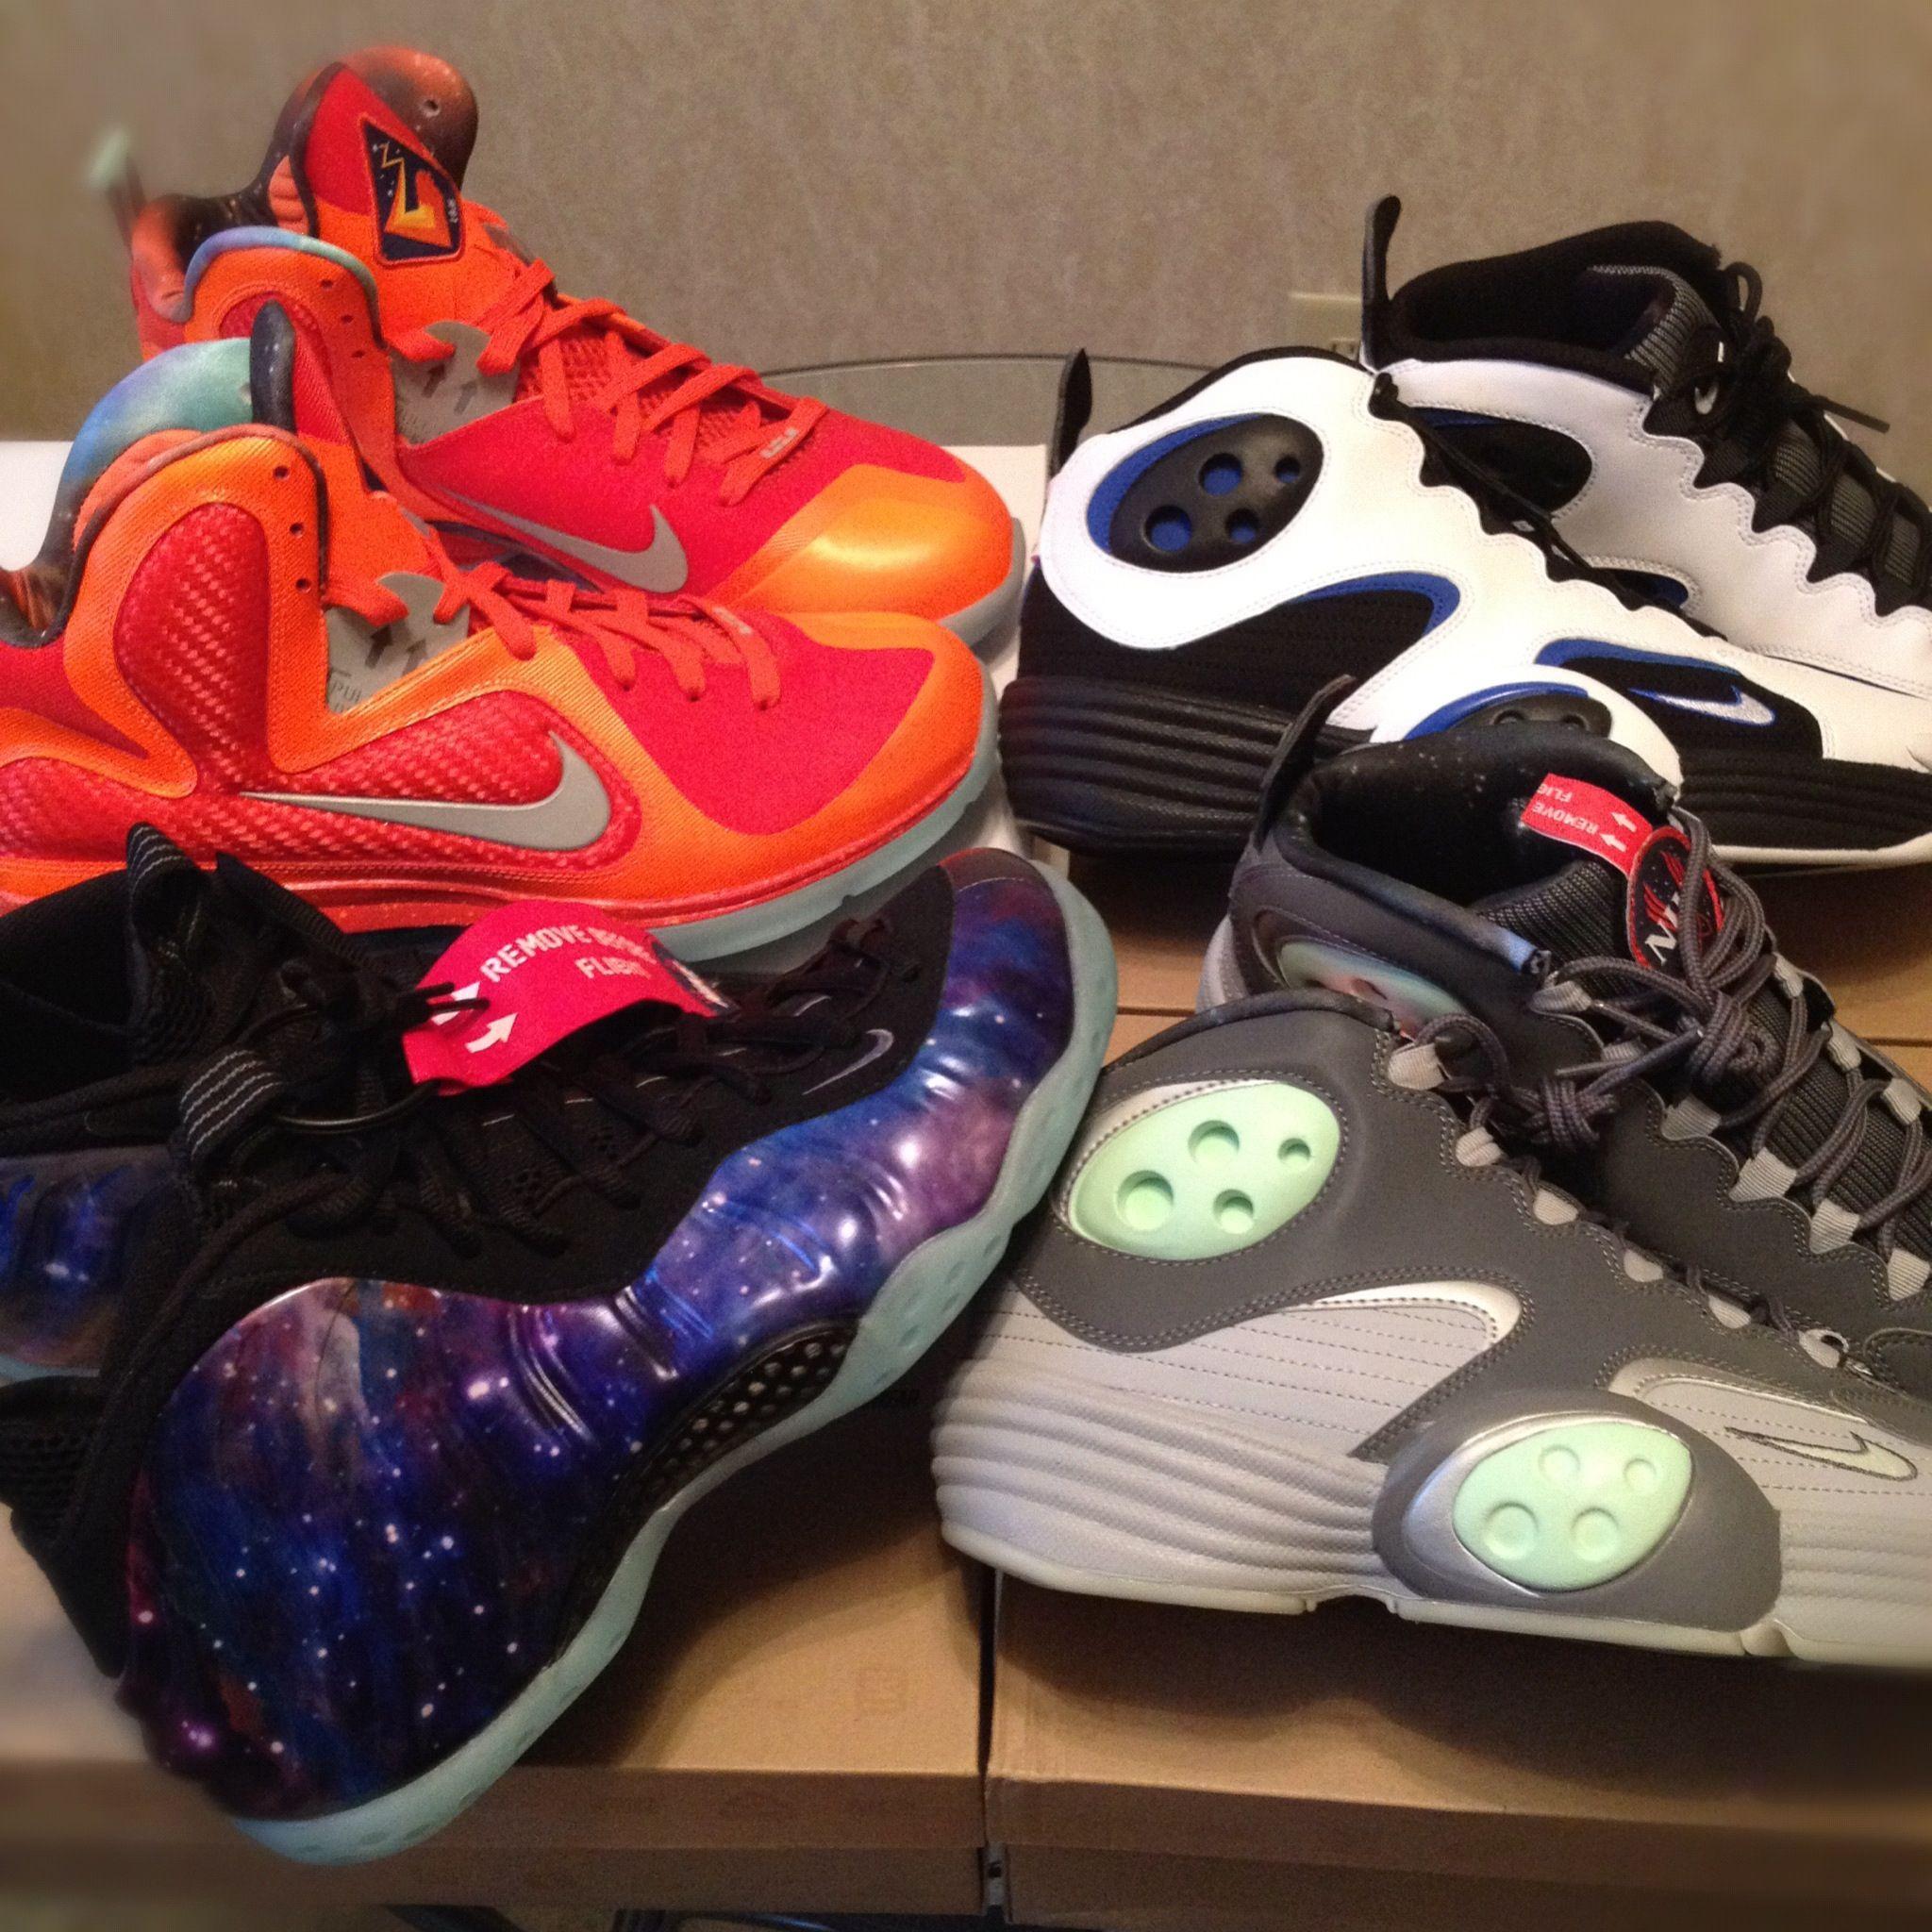 Dar caridad Vacío  Galaxy Pack, nike, kobe, lebron, foamposite, penny, air penny 1, zoom, nike  air, big bangs, galaxy rookies, pros, tigerwoods, 2 chai… | Nike galaxy,  Shoes, Sneakers